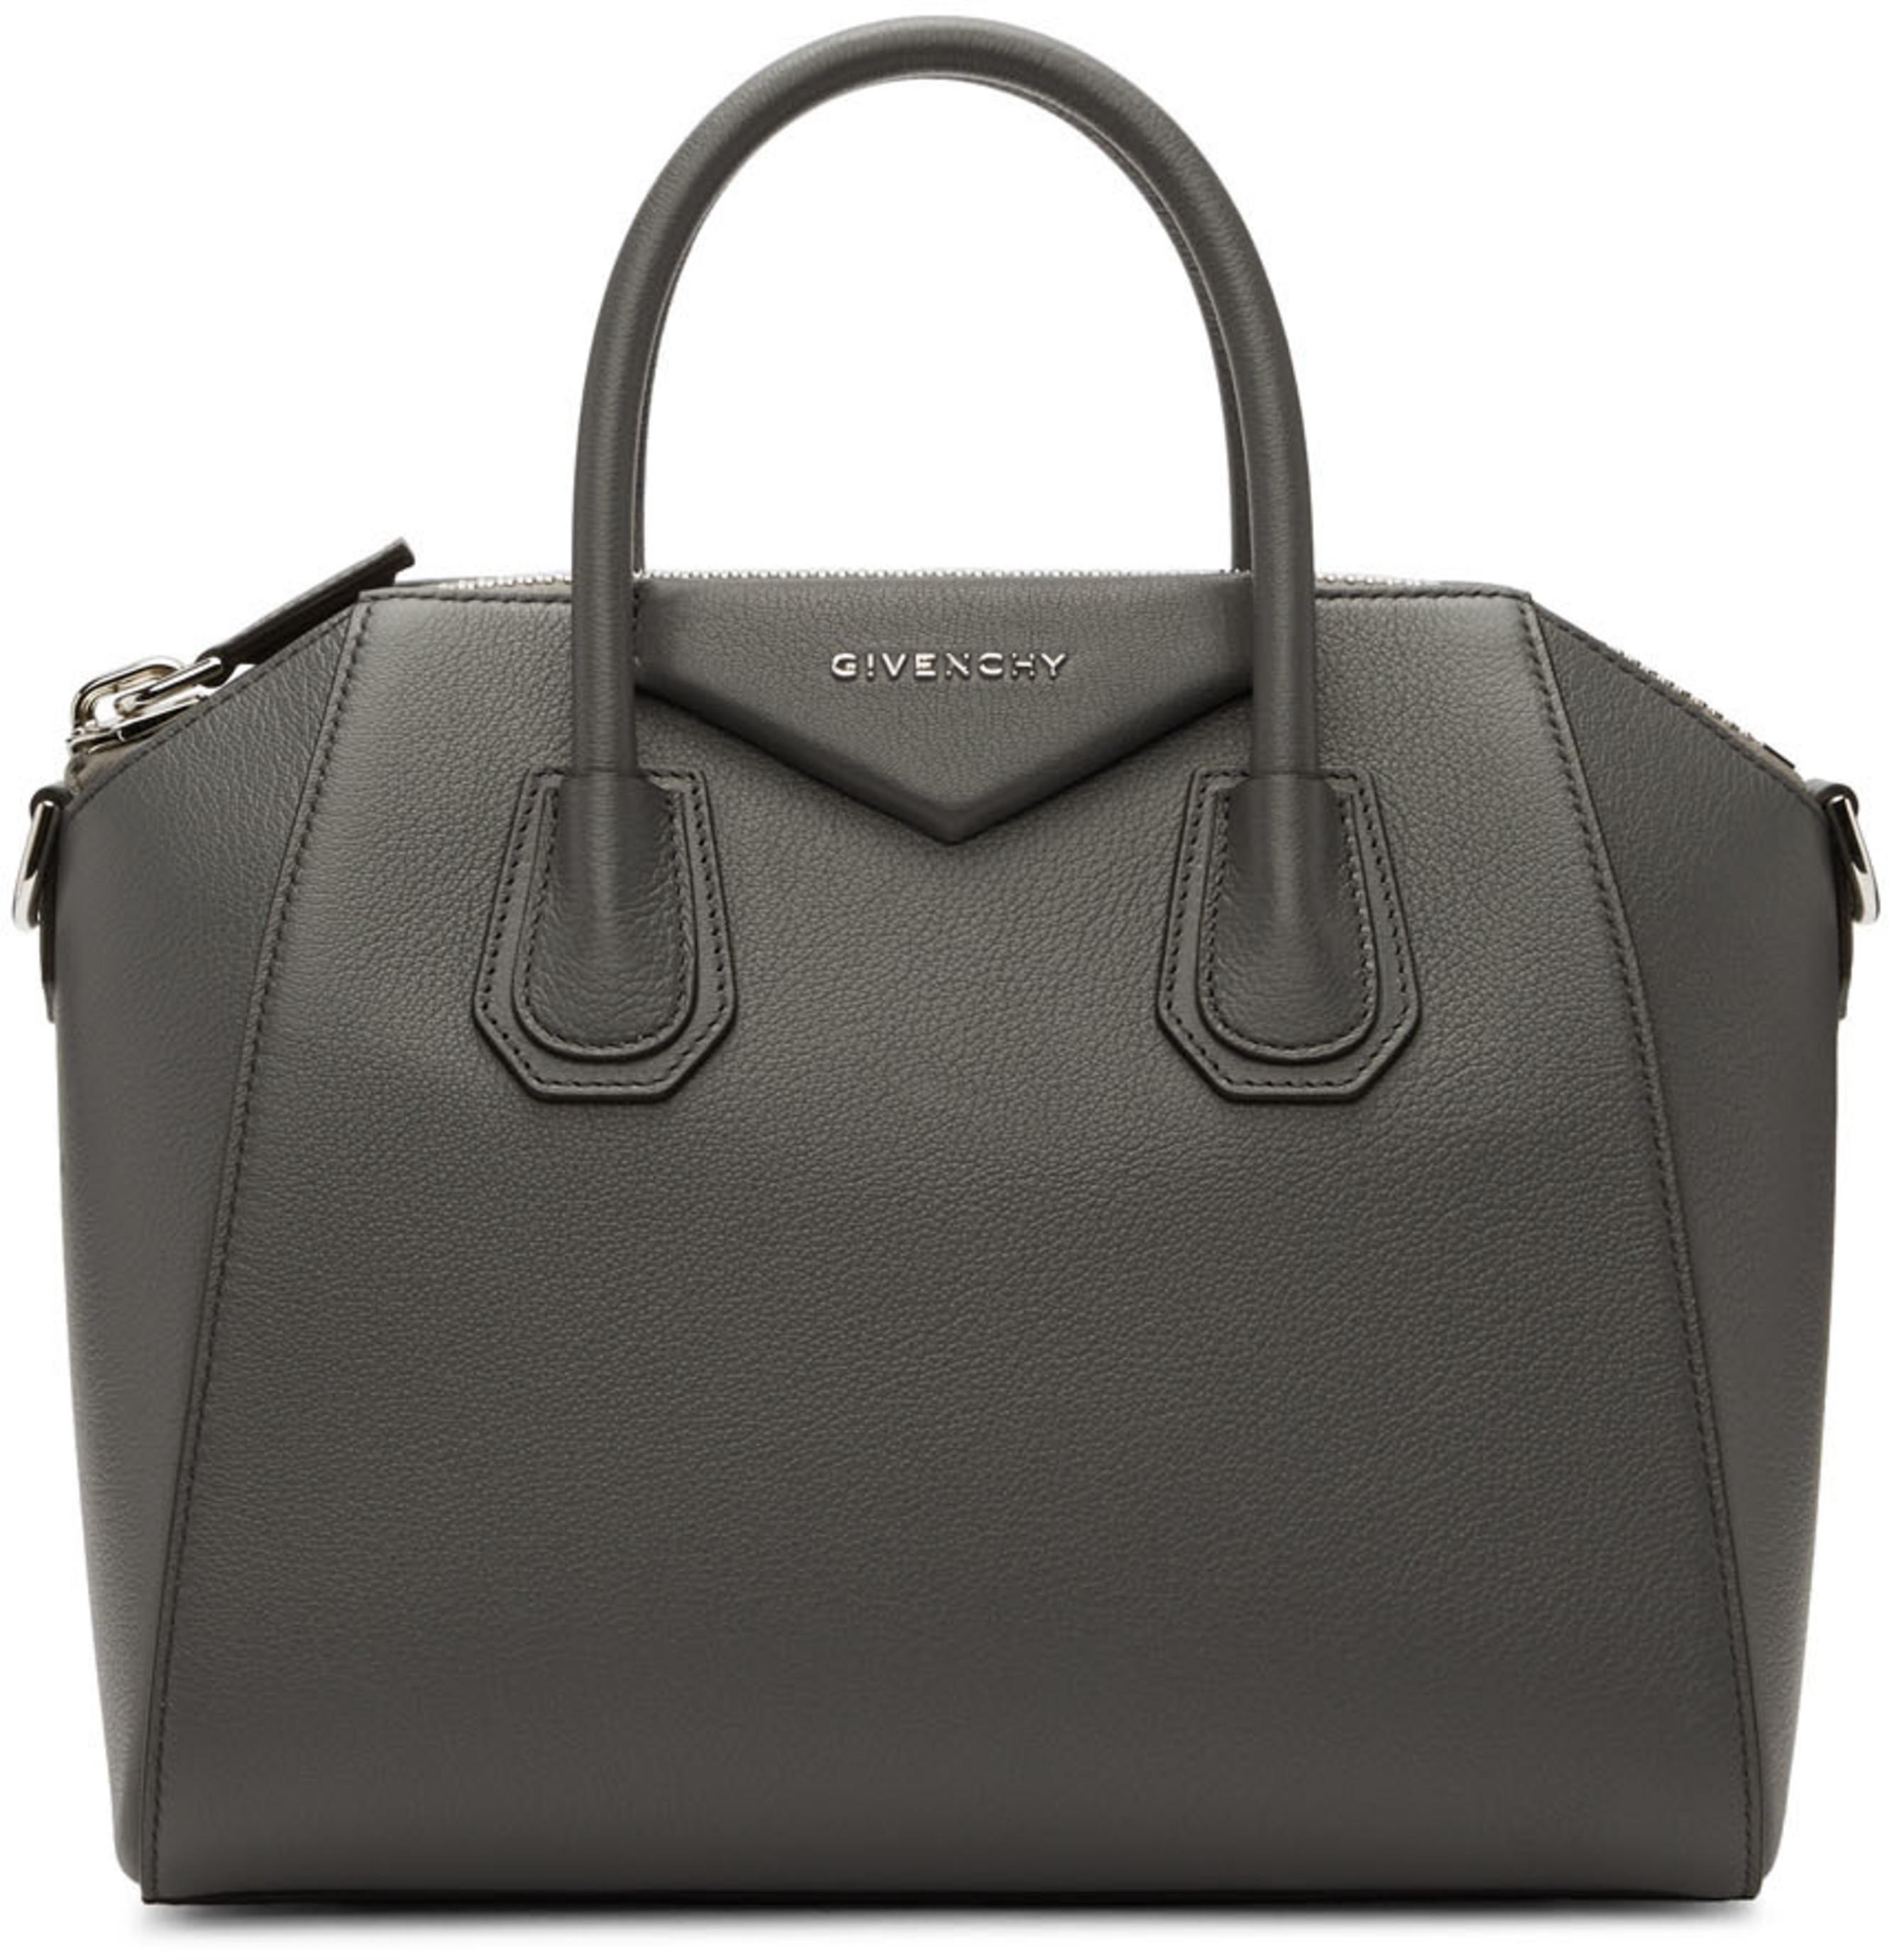 9e45886cc6fc0 Givenchy bags for Women | SSENSE